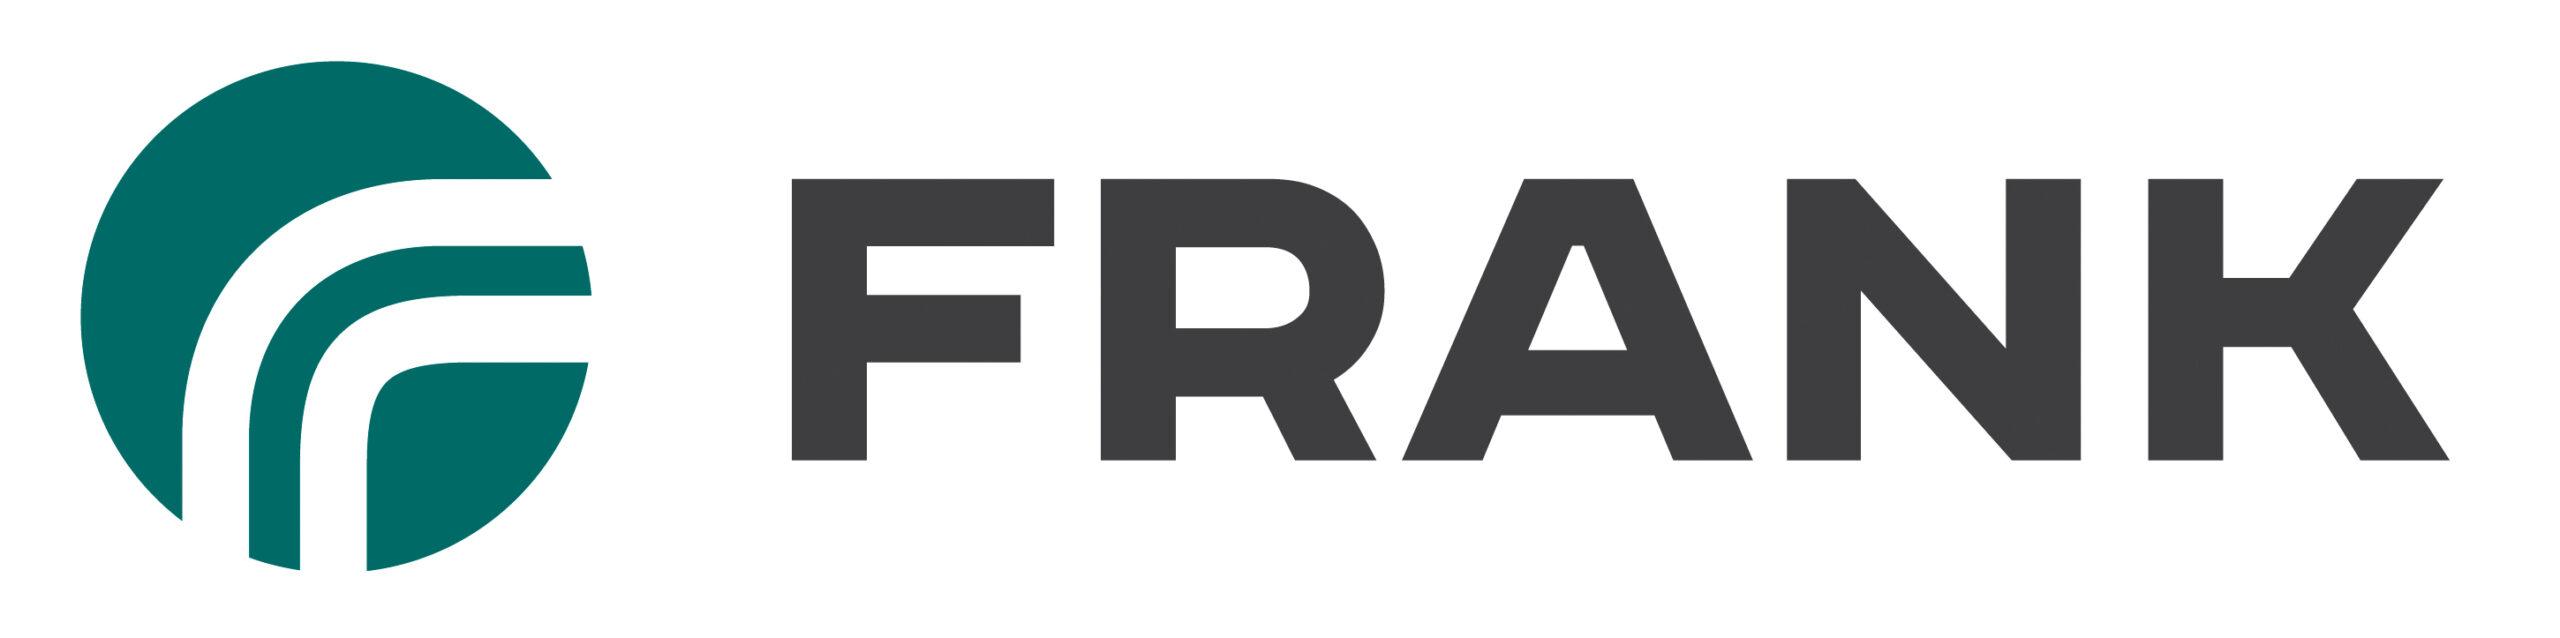 https://www.bohrtechniktage.de/wp-content/uploads/frank-logo_horizontal_rgb_neu-scaled.jpg